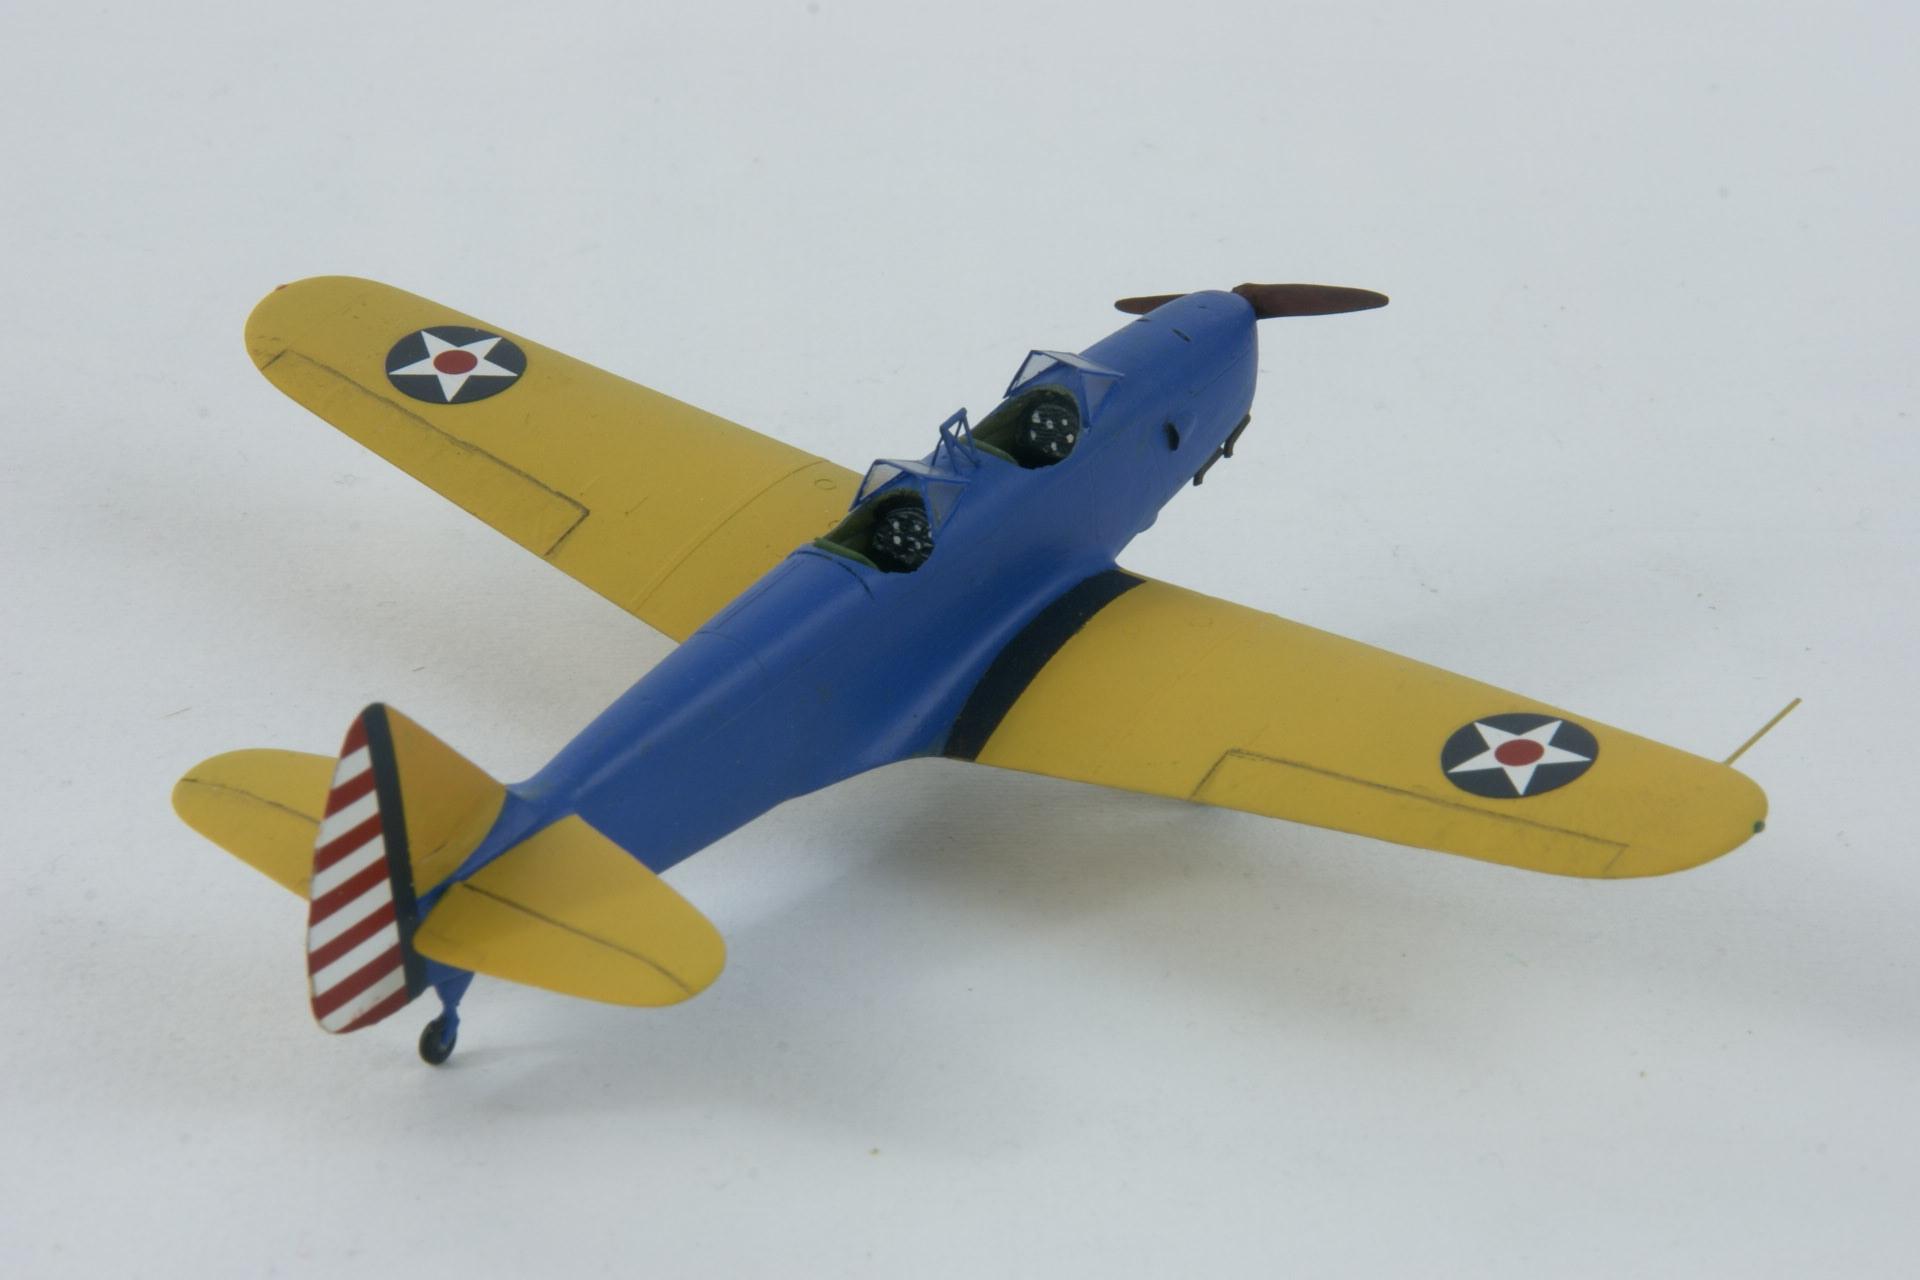 Fairchild pt 19 cornell 2 2